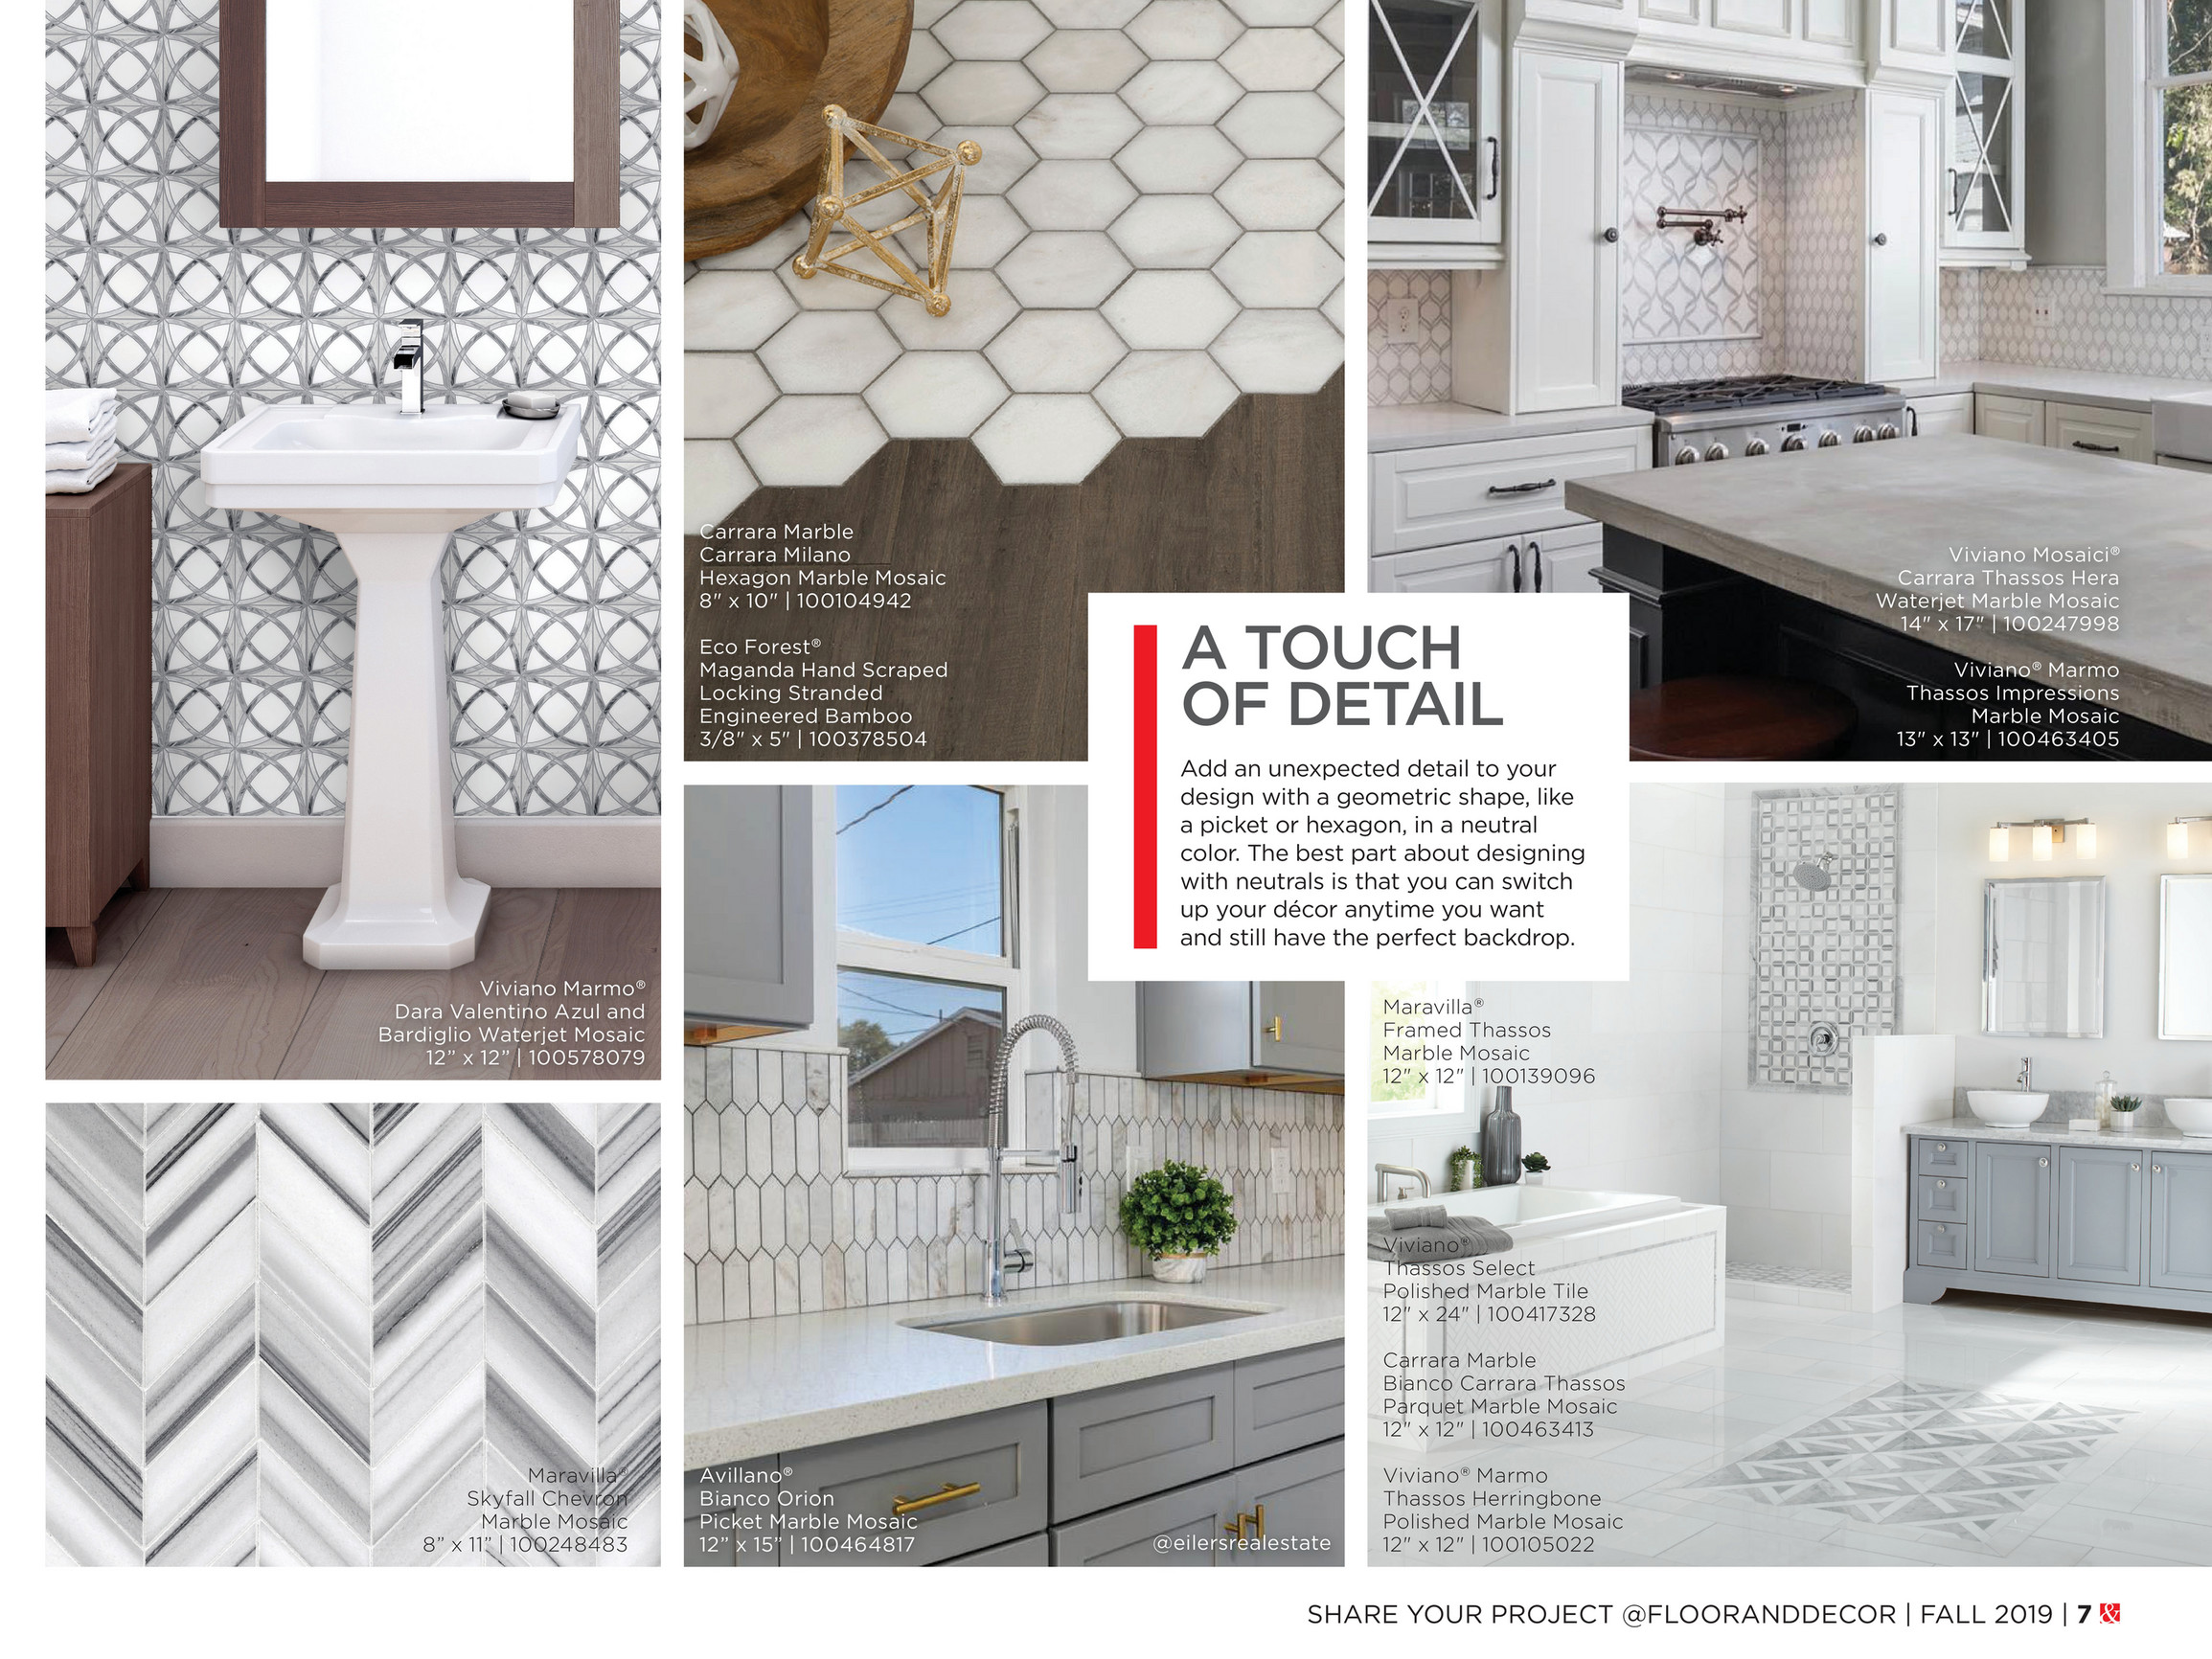 Fall 2019 Inspiration Catalog Floor Decor Viviano Marmo Thassos Herringbone Polished Marble Mosaic Tile 12 X 12 White 0 4 Inch Thick Floor Decor